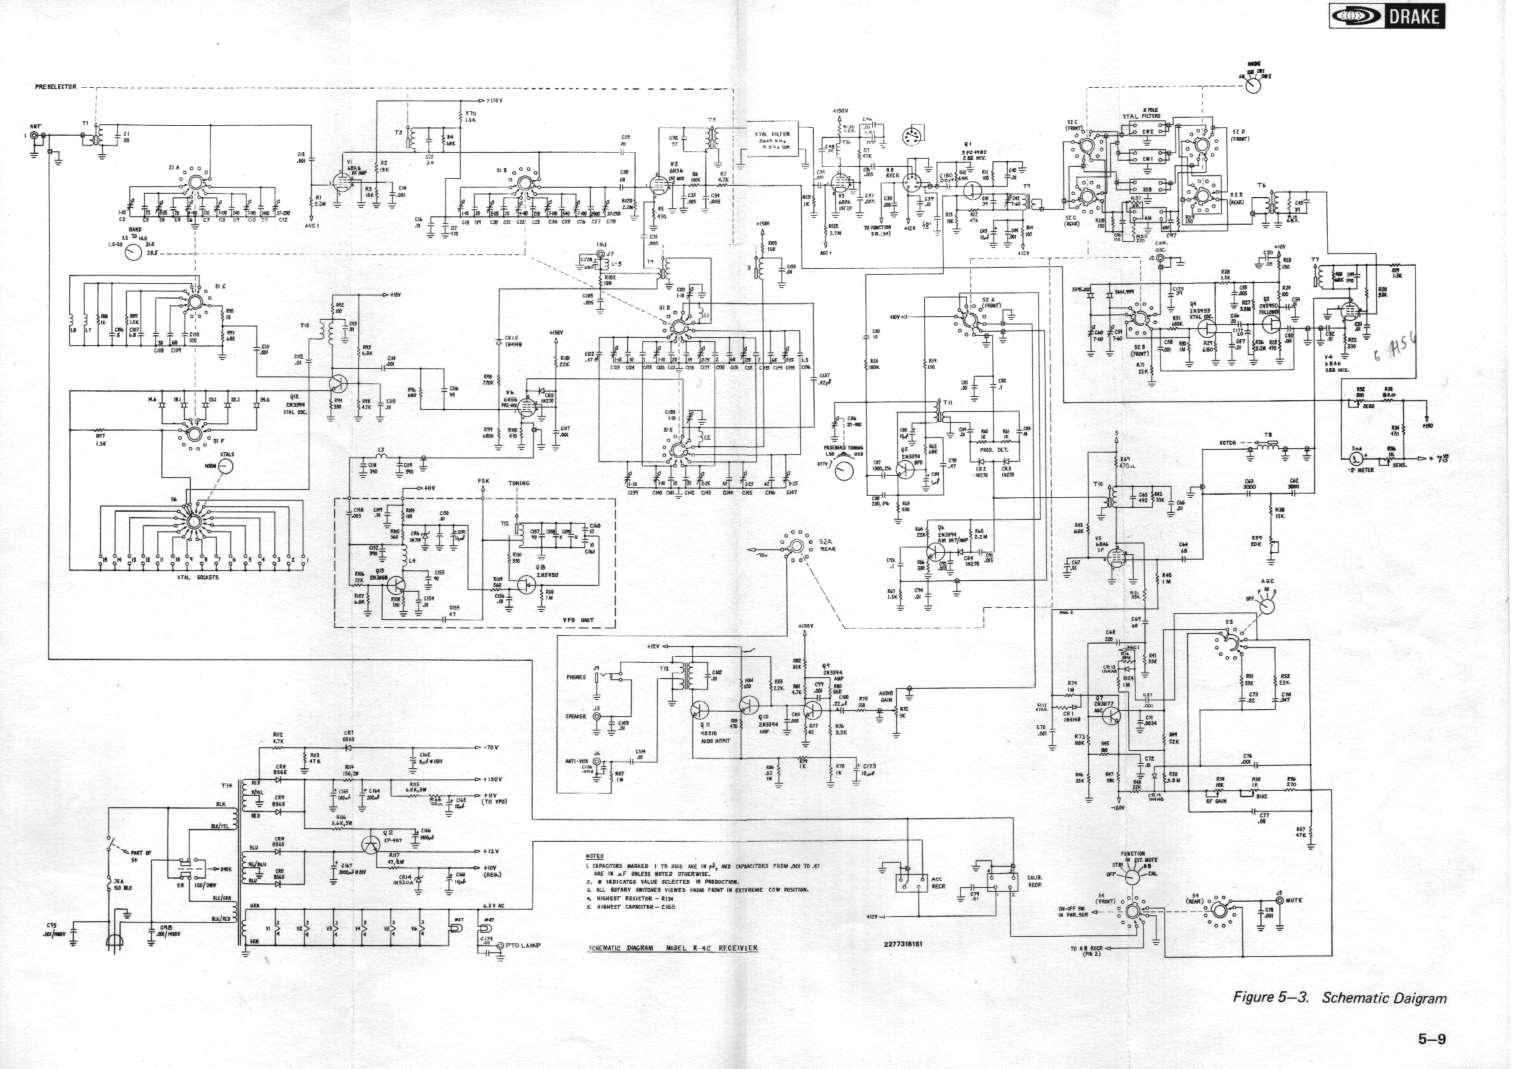 r4c5 10 jpg rh wb4hfn com Cline Drake Piping and Instrumentation Diagram